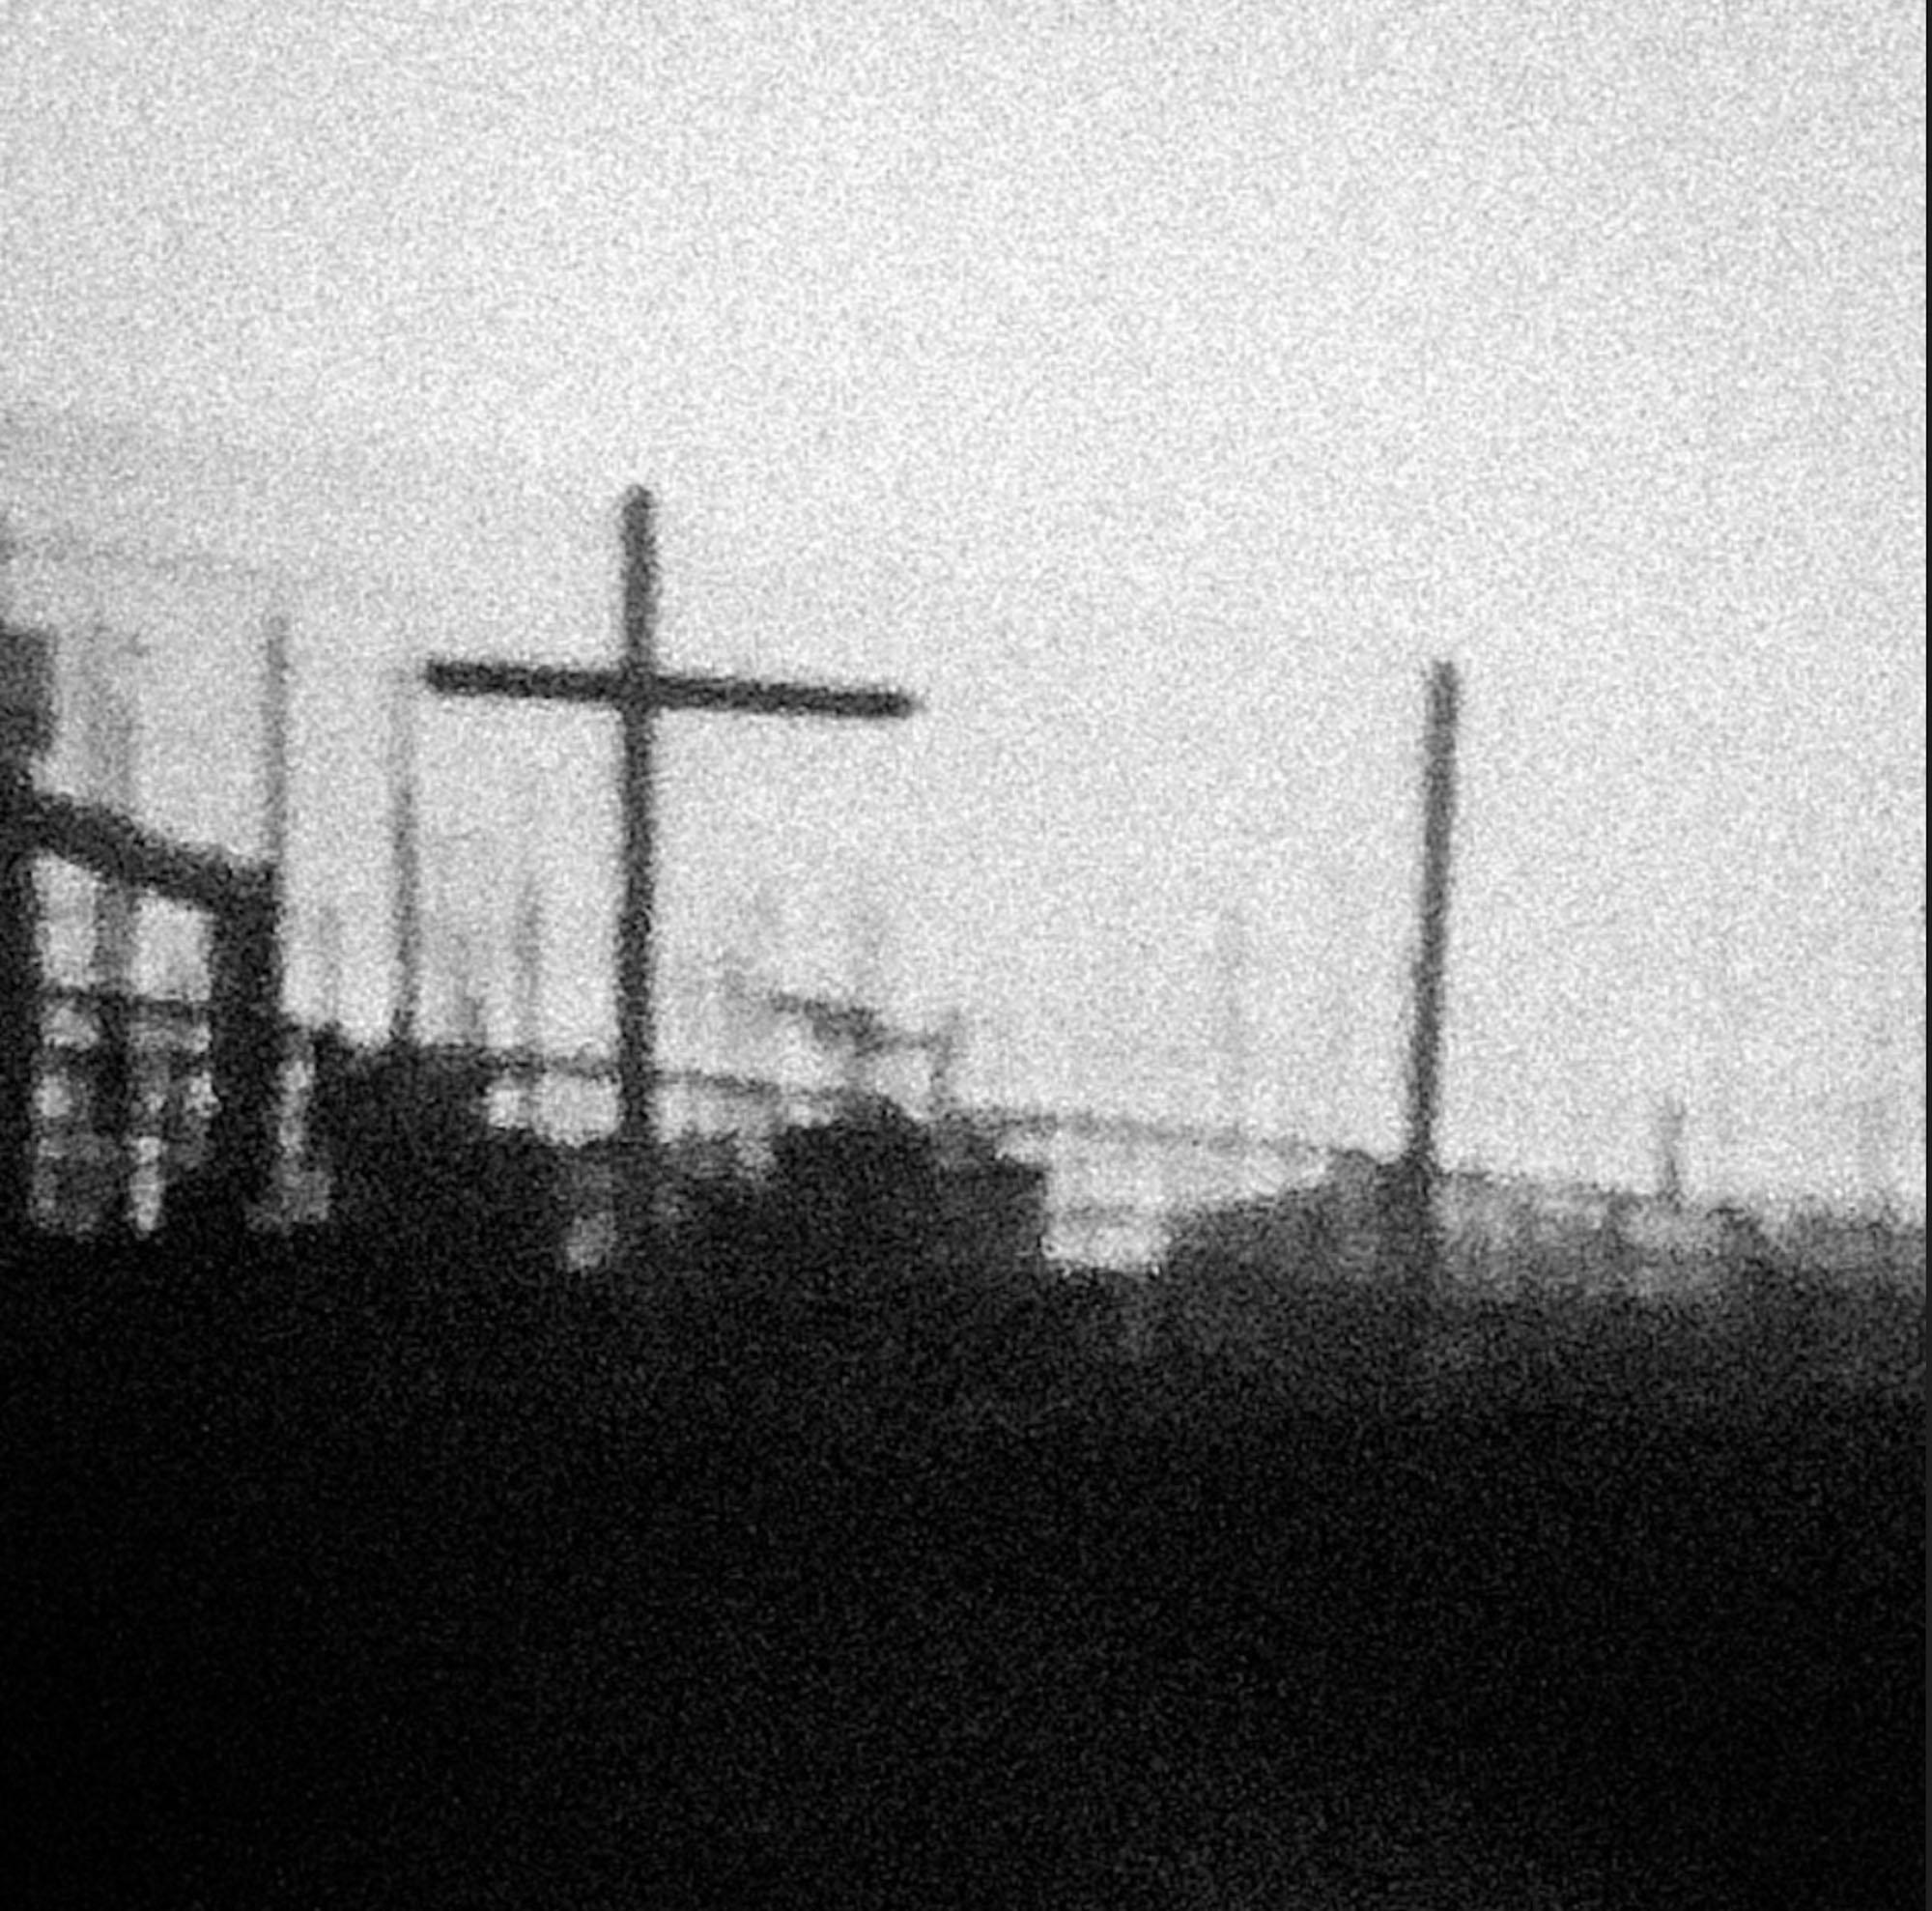 Industrialised-image-3-copy